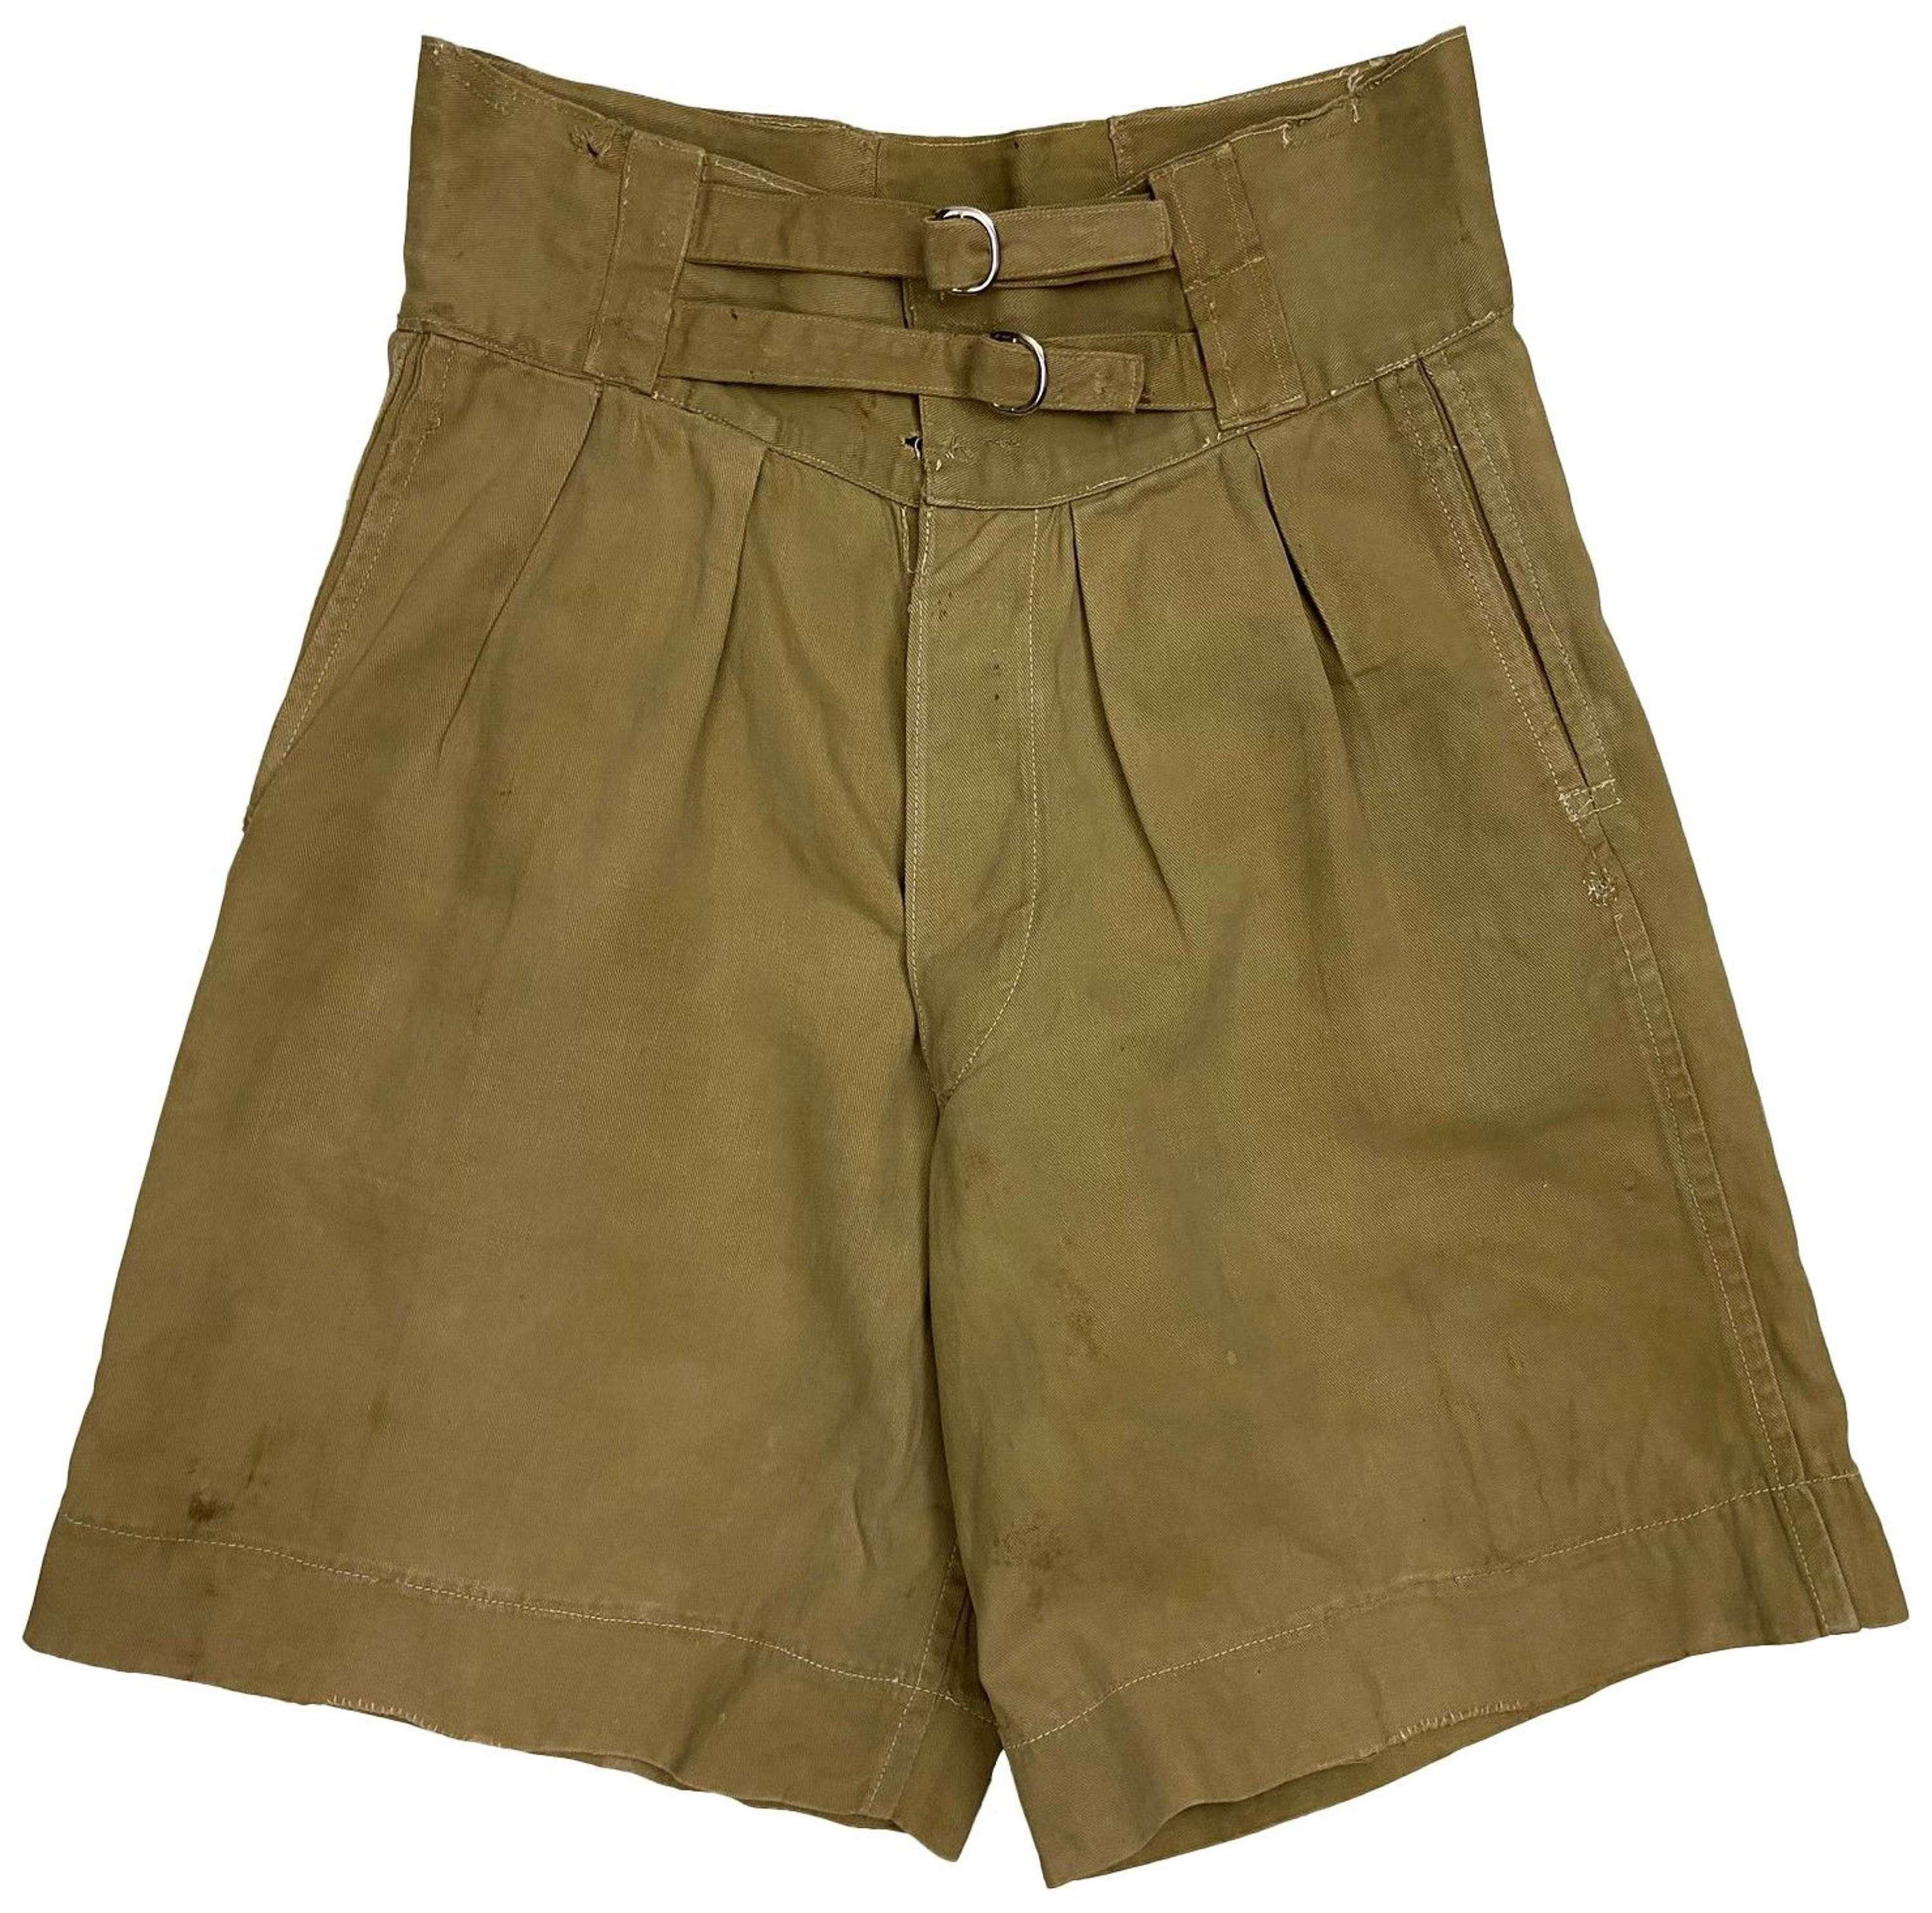 Original WW2 British 1941 Pattern Khaki Drill Shorts